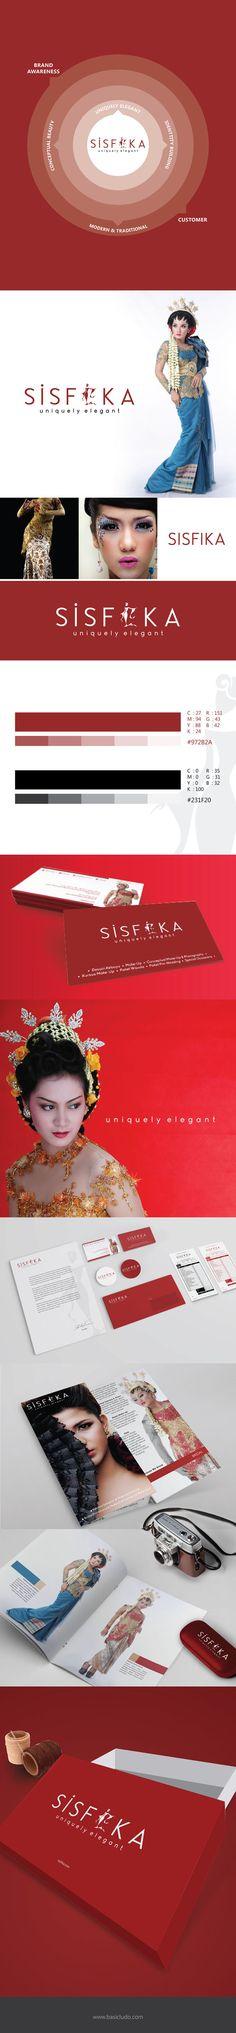 SISFIKA - Yogyakarta, Indonesia